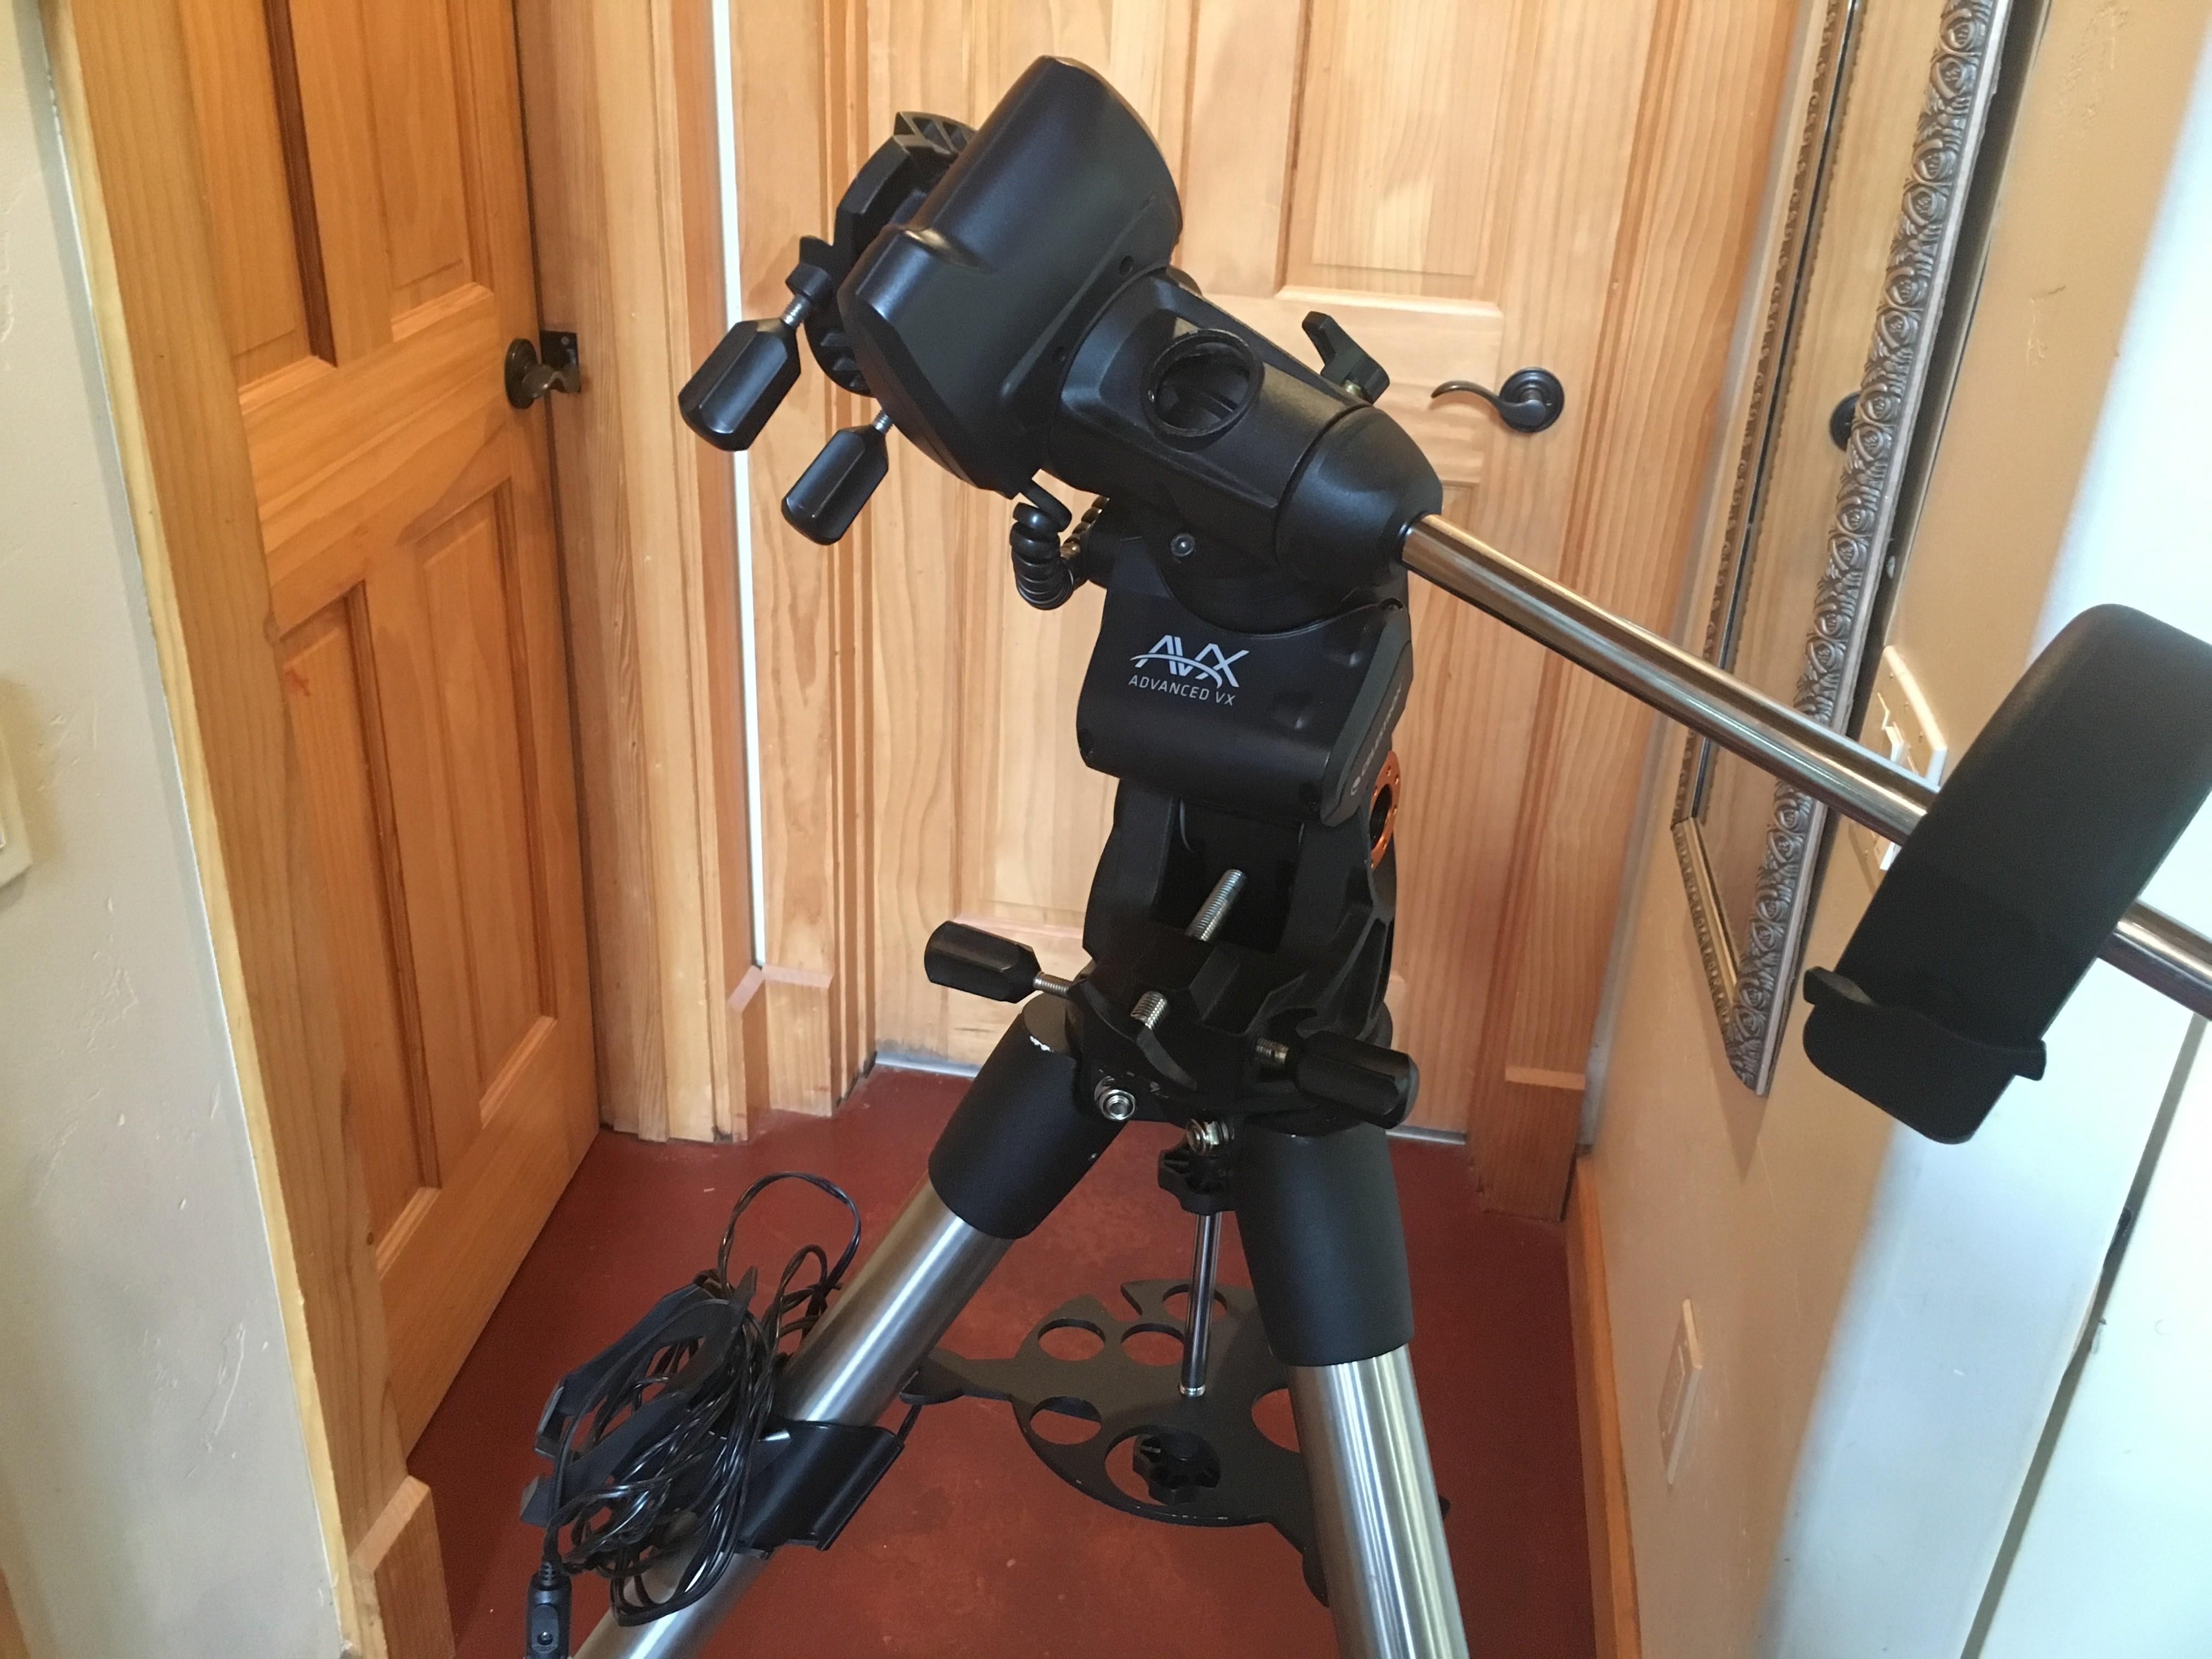 Celestron AVX mount w/wifi SkyPortal, StarSense - camera and